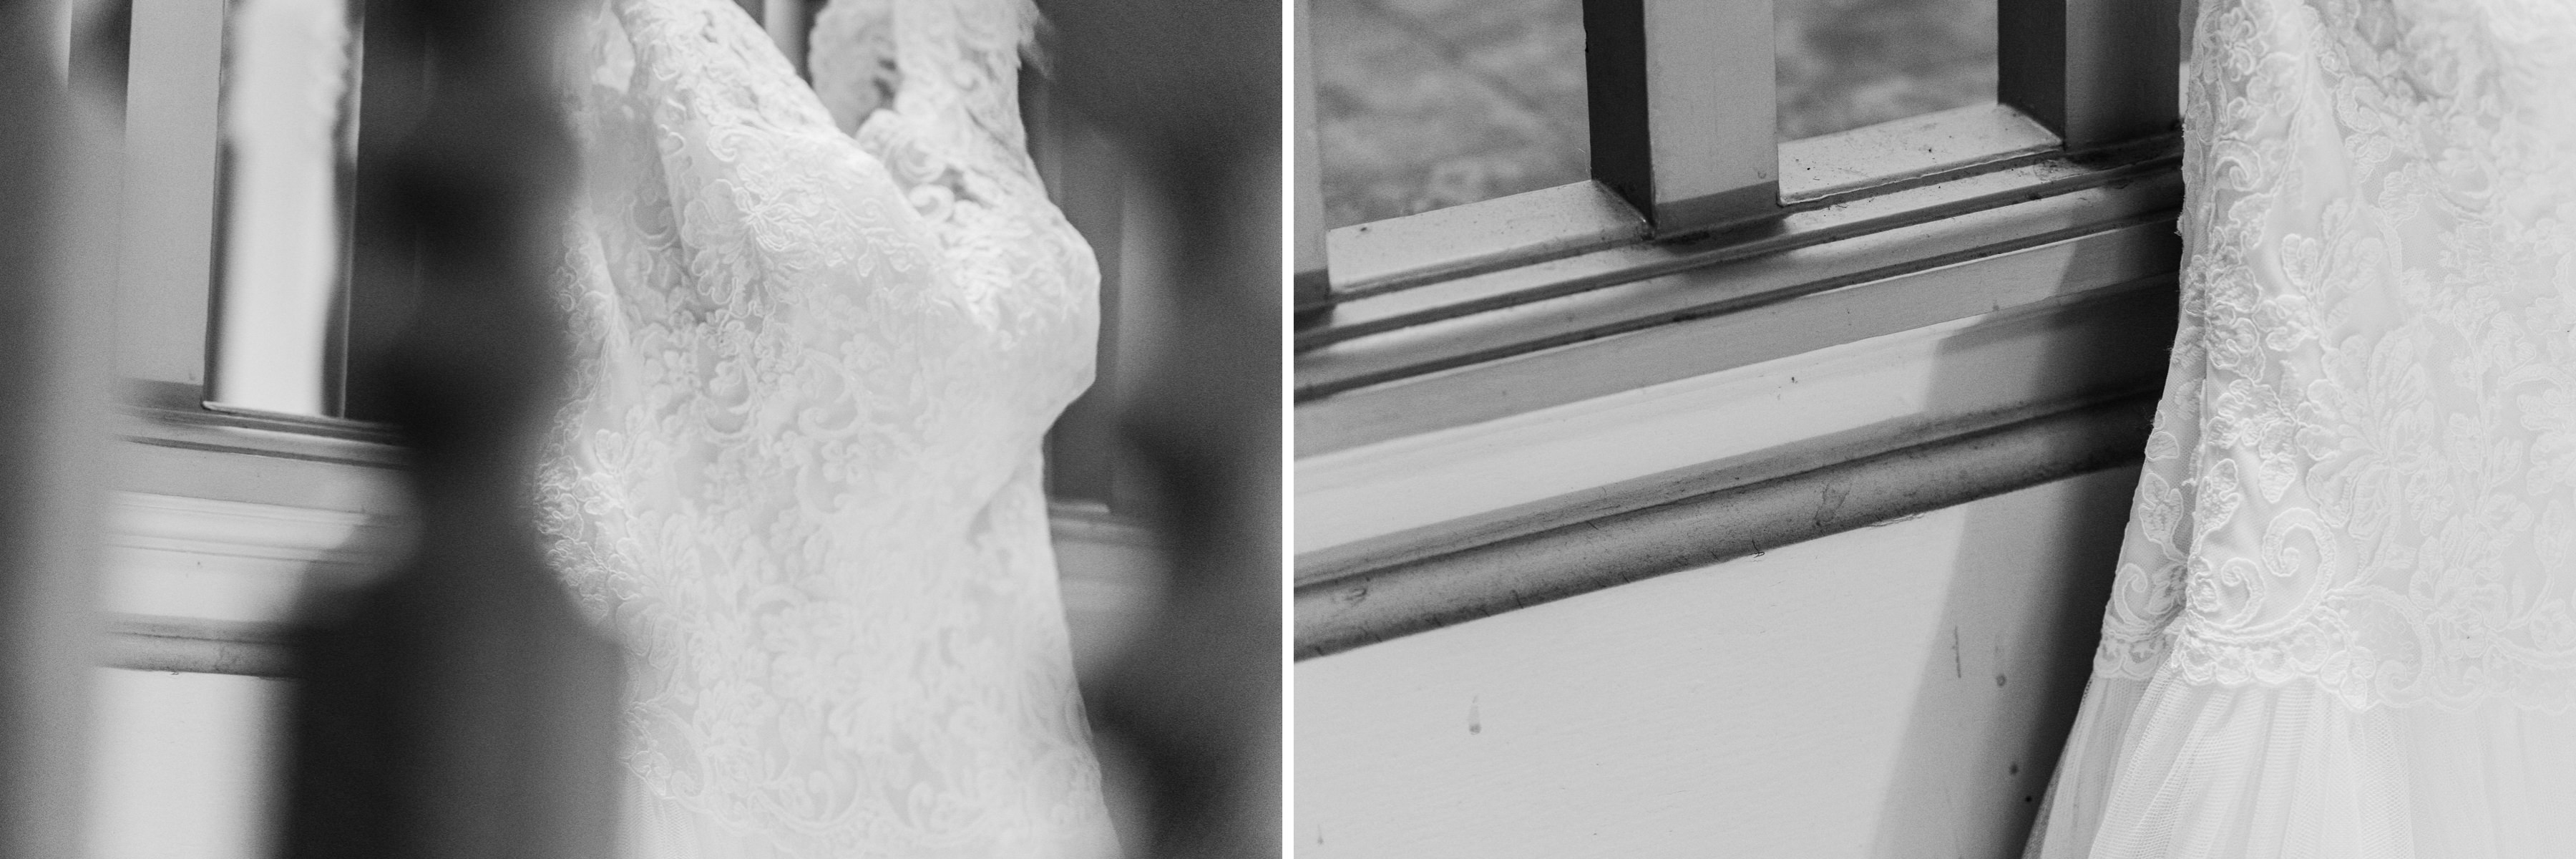 MAULDIN_WEDDING_MONTGOMERY_ALABAMA_WEDDING_PHOTOGRAPHY_08